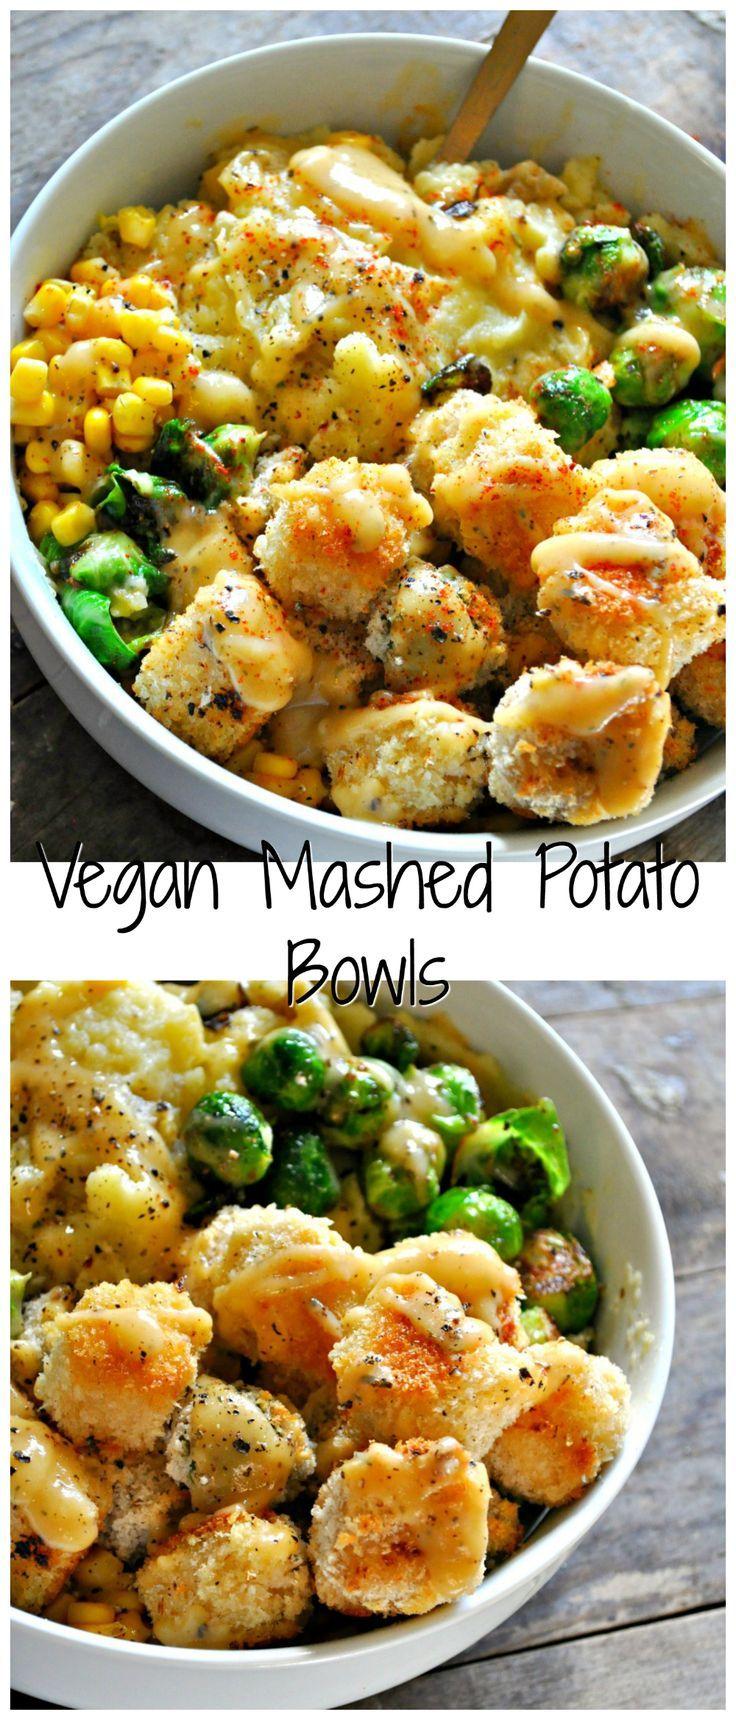 Photo of Vegan Mashed Potato Bowls